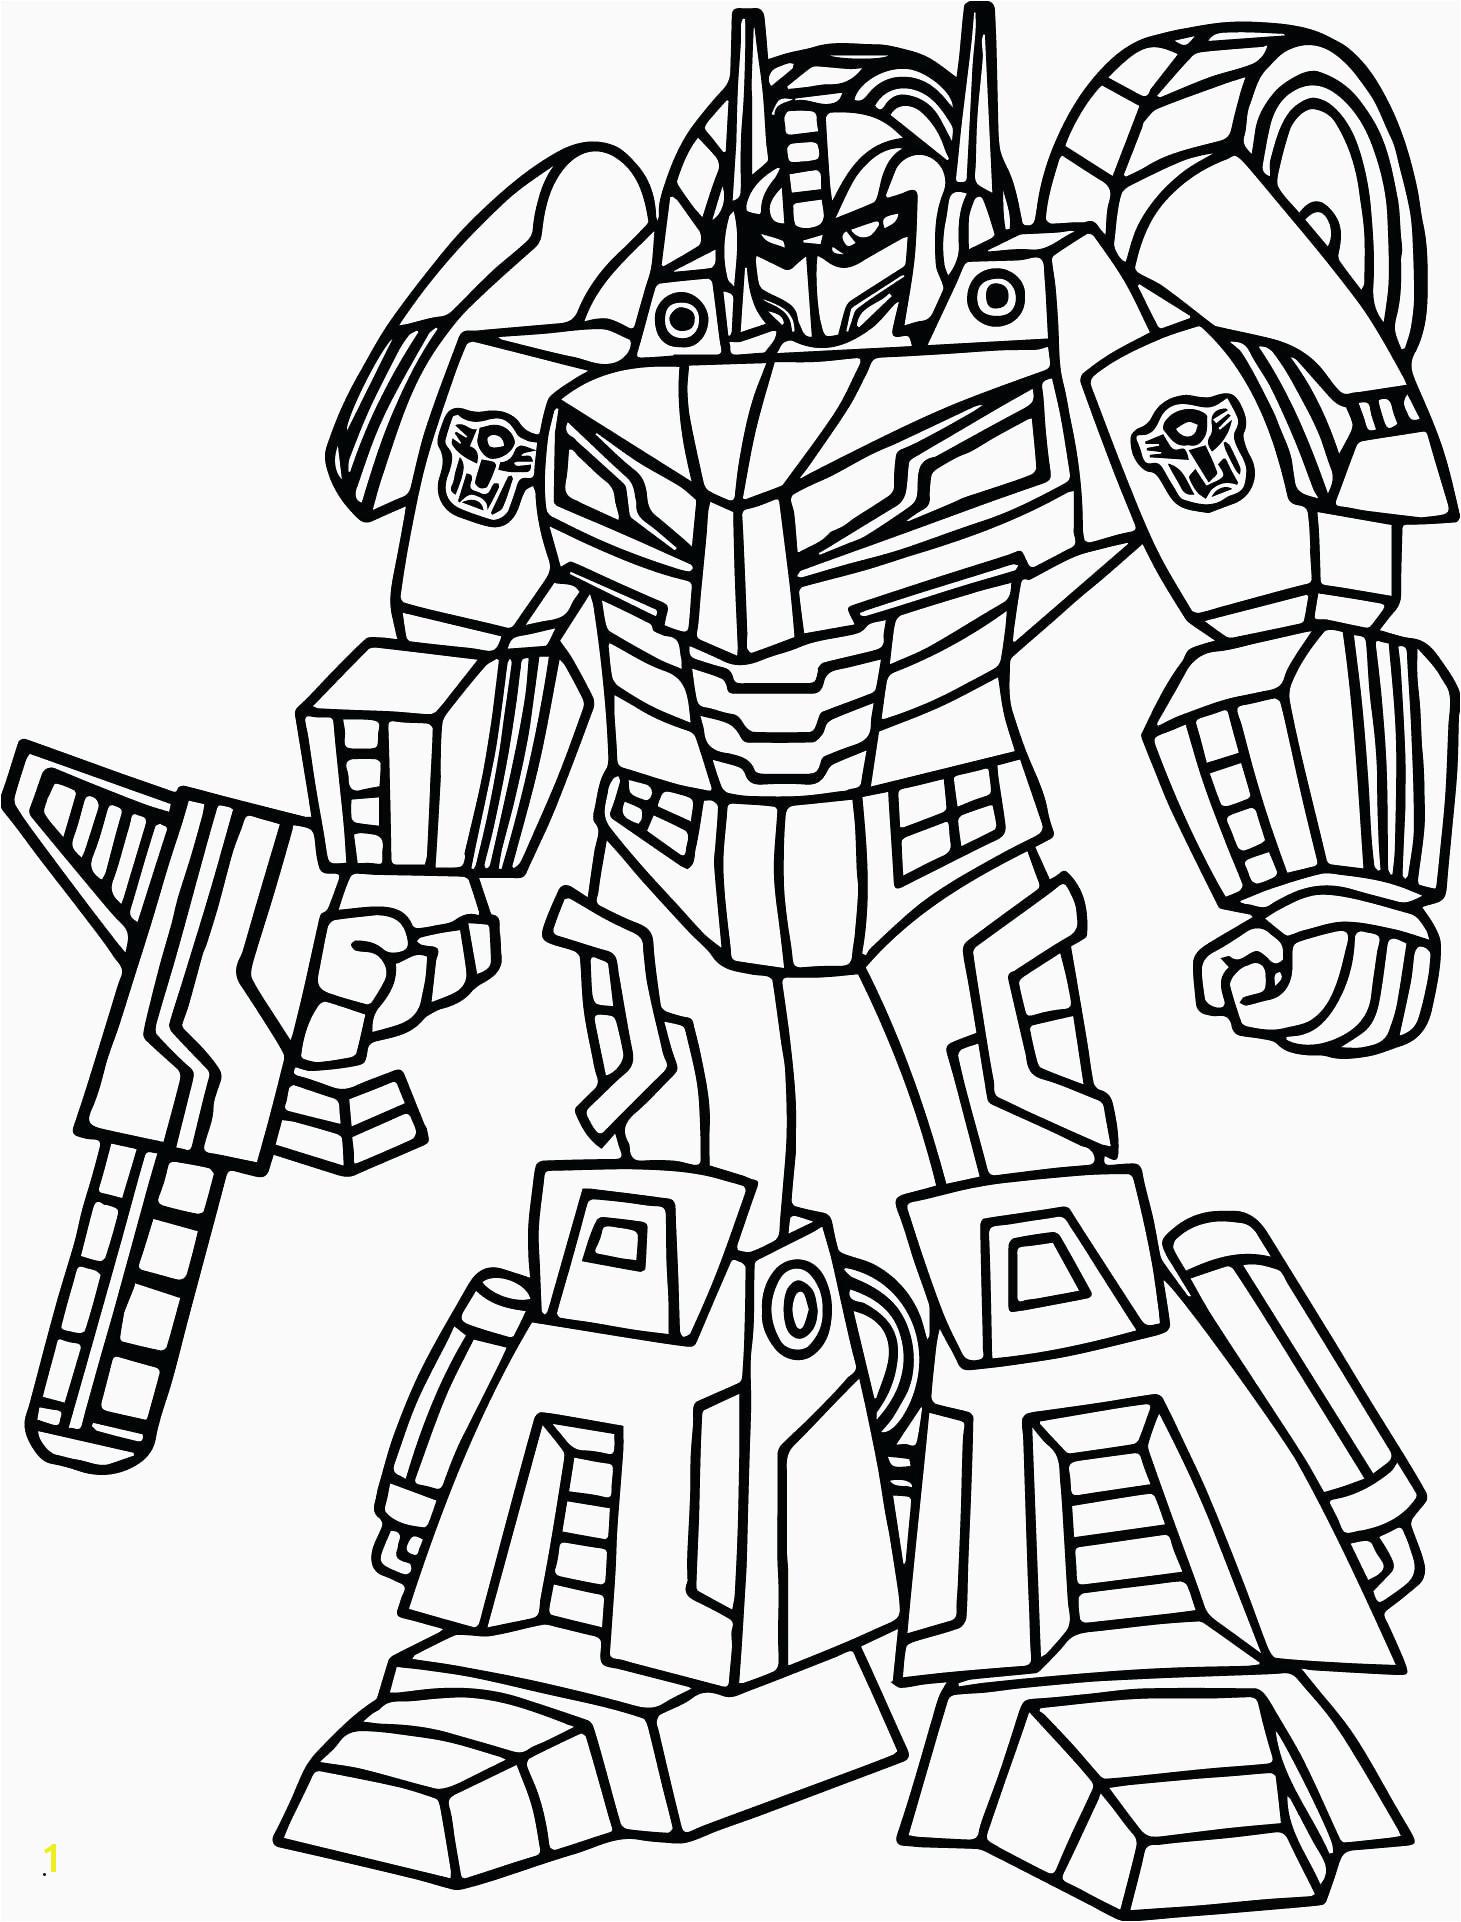 Free Printable Transformers Coloring Pages 40 Ausmalbilder Zum Genial Transformers Bumblebee Ausmalbilder